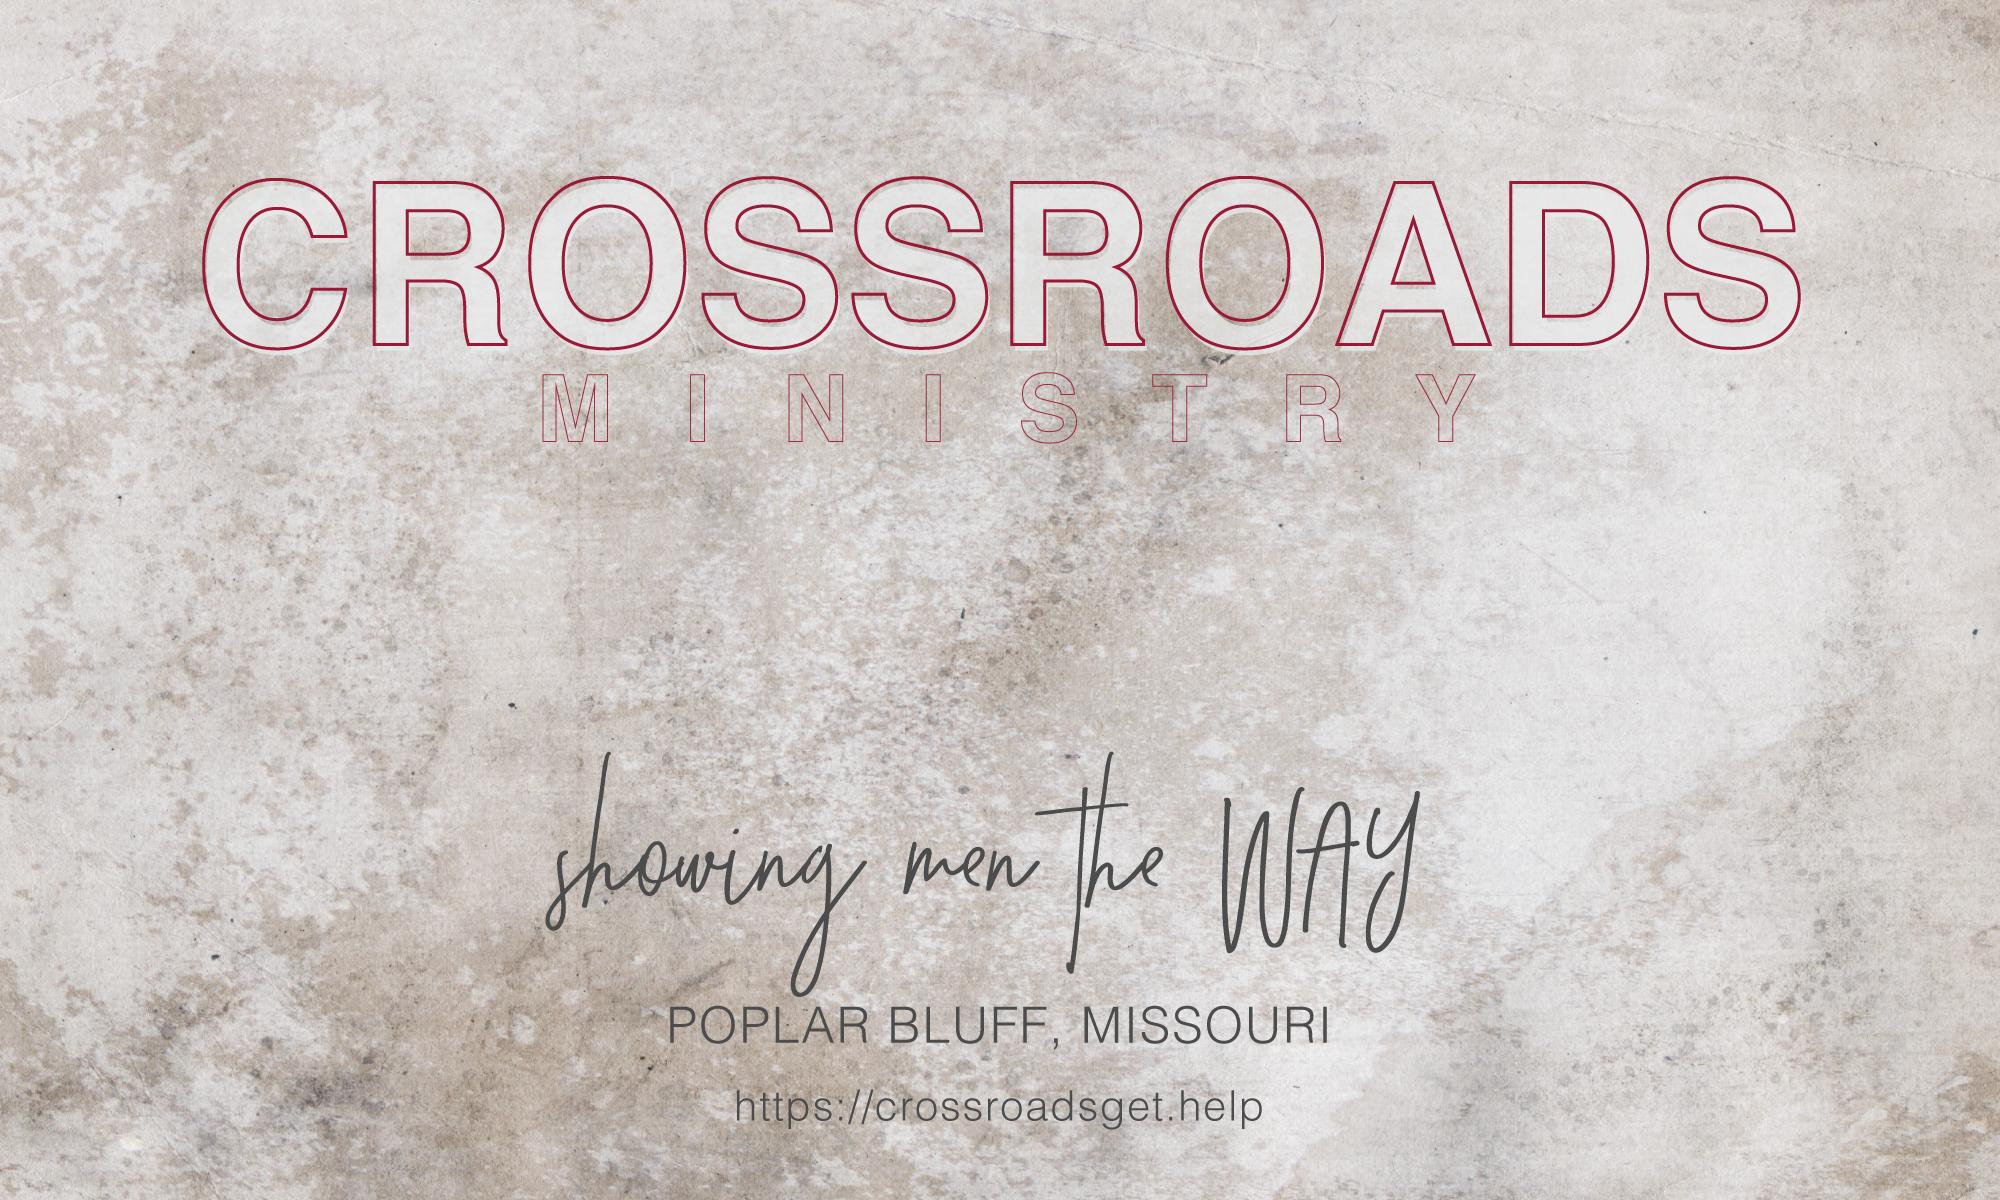 Crossroads Ministry showing men the WAY Poplar Bluff MO crossroadsget.help grunge background